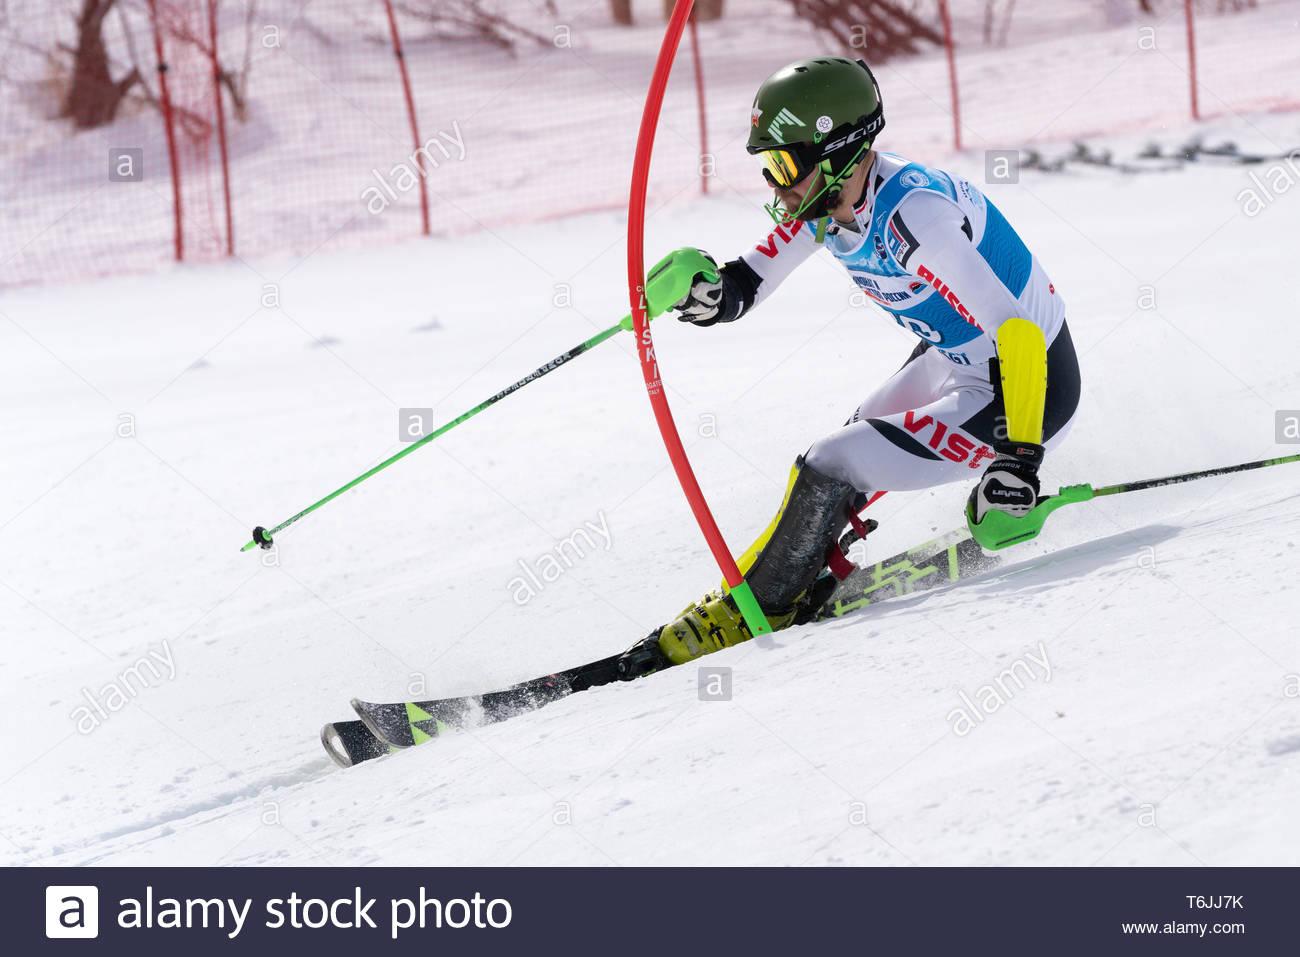 MOROZNAYA MOUNTAIN, KAMCHATKA, RUSSIA - MAR 29, 2019: International Ski Federation Championship, Russian Alpine Skiing Championship, slalom. Mount ski Stock Photo